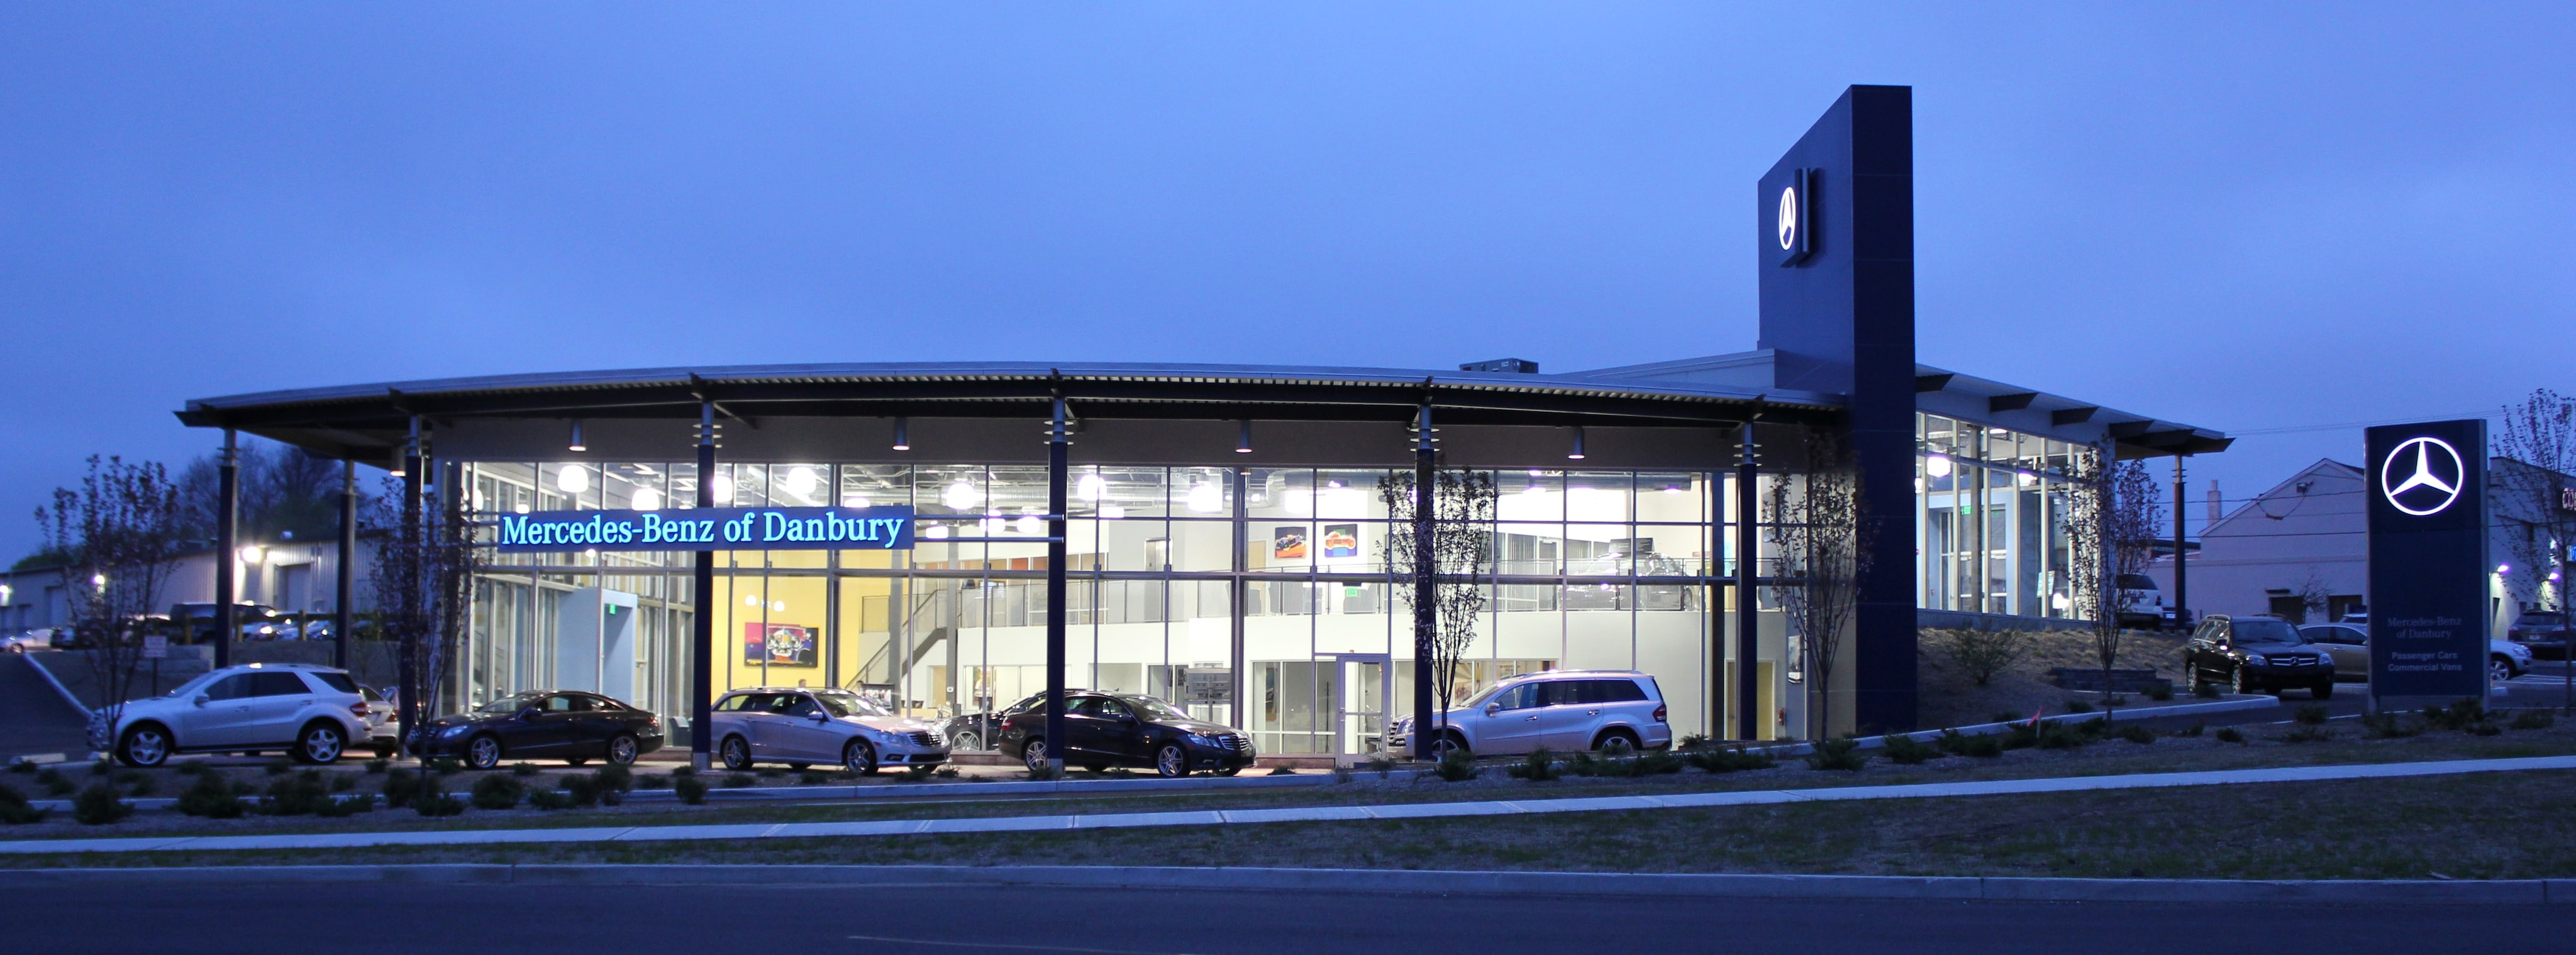 bc cla mercedes dealership on richmond home in slider dealer benz